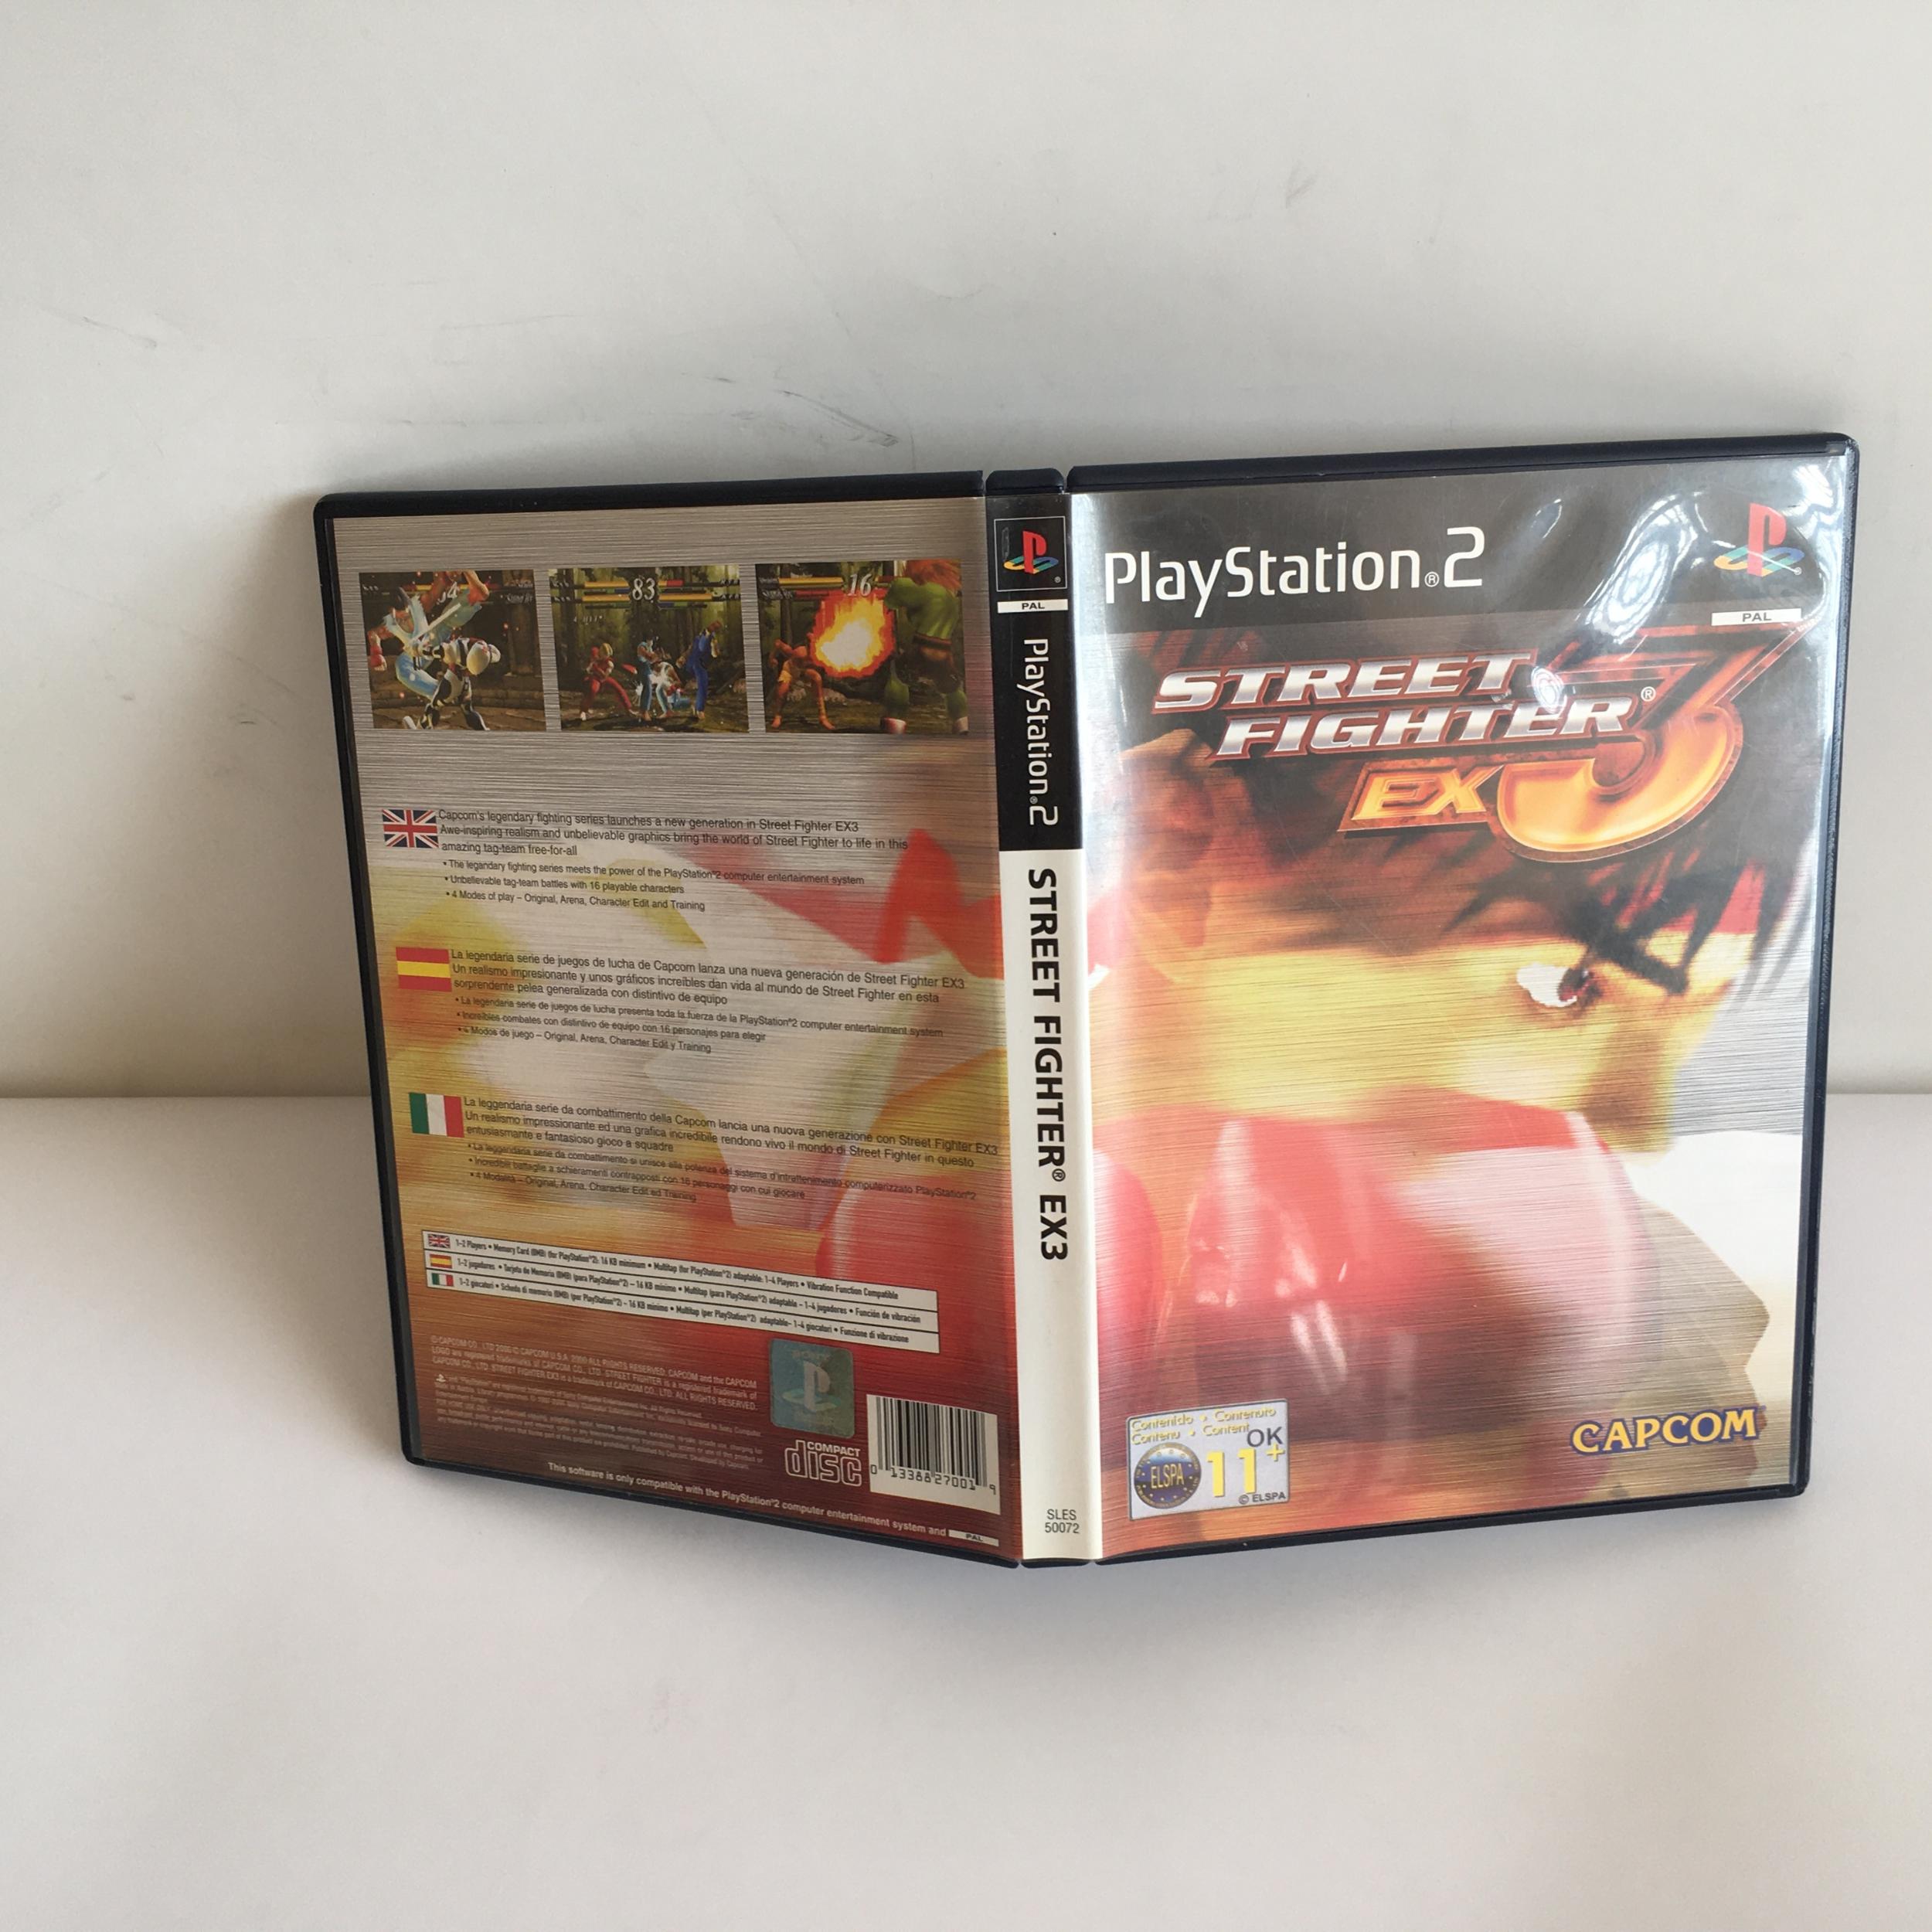 Street Fighter 3 EX PS2